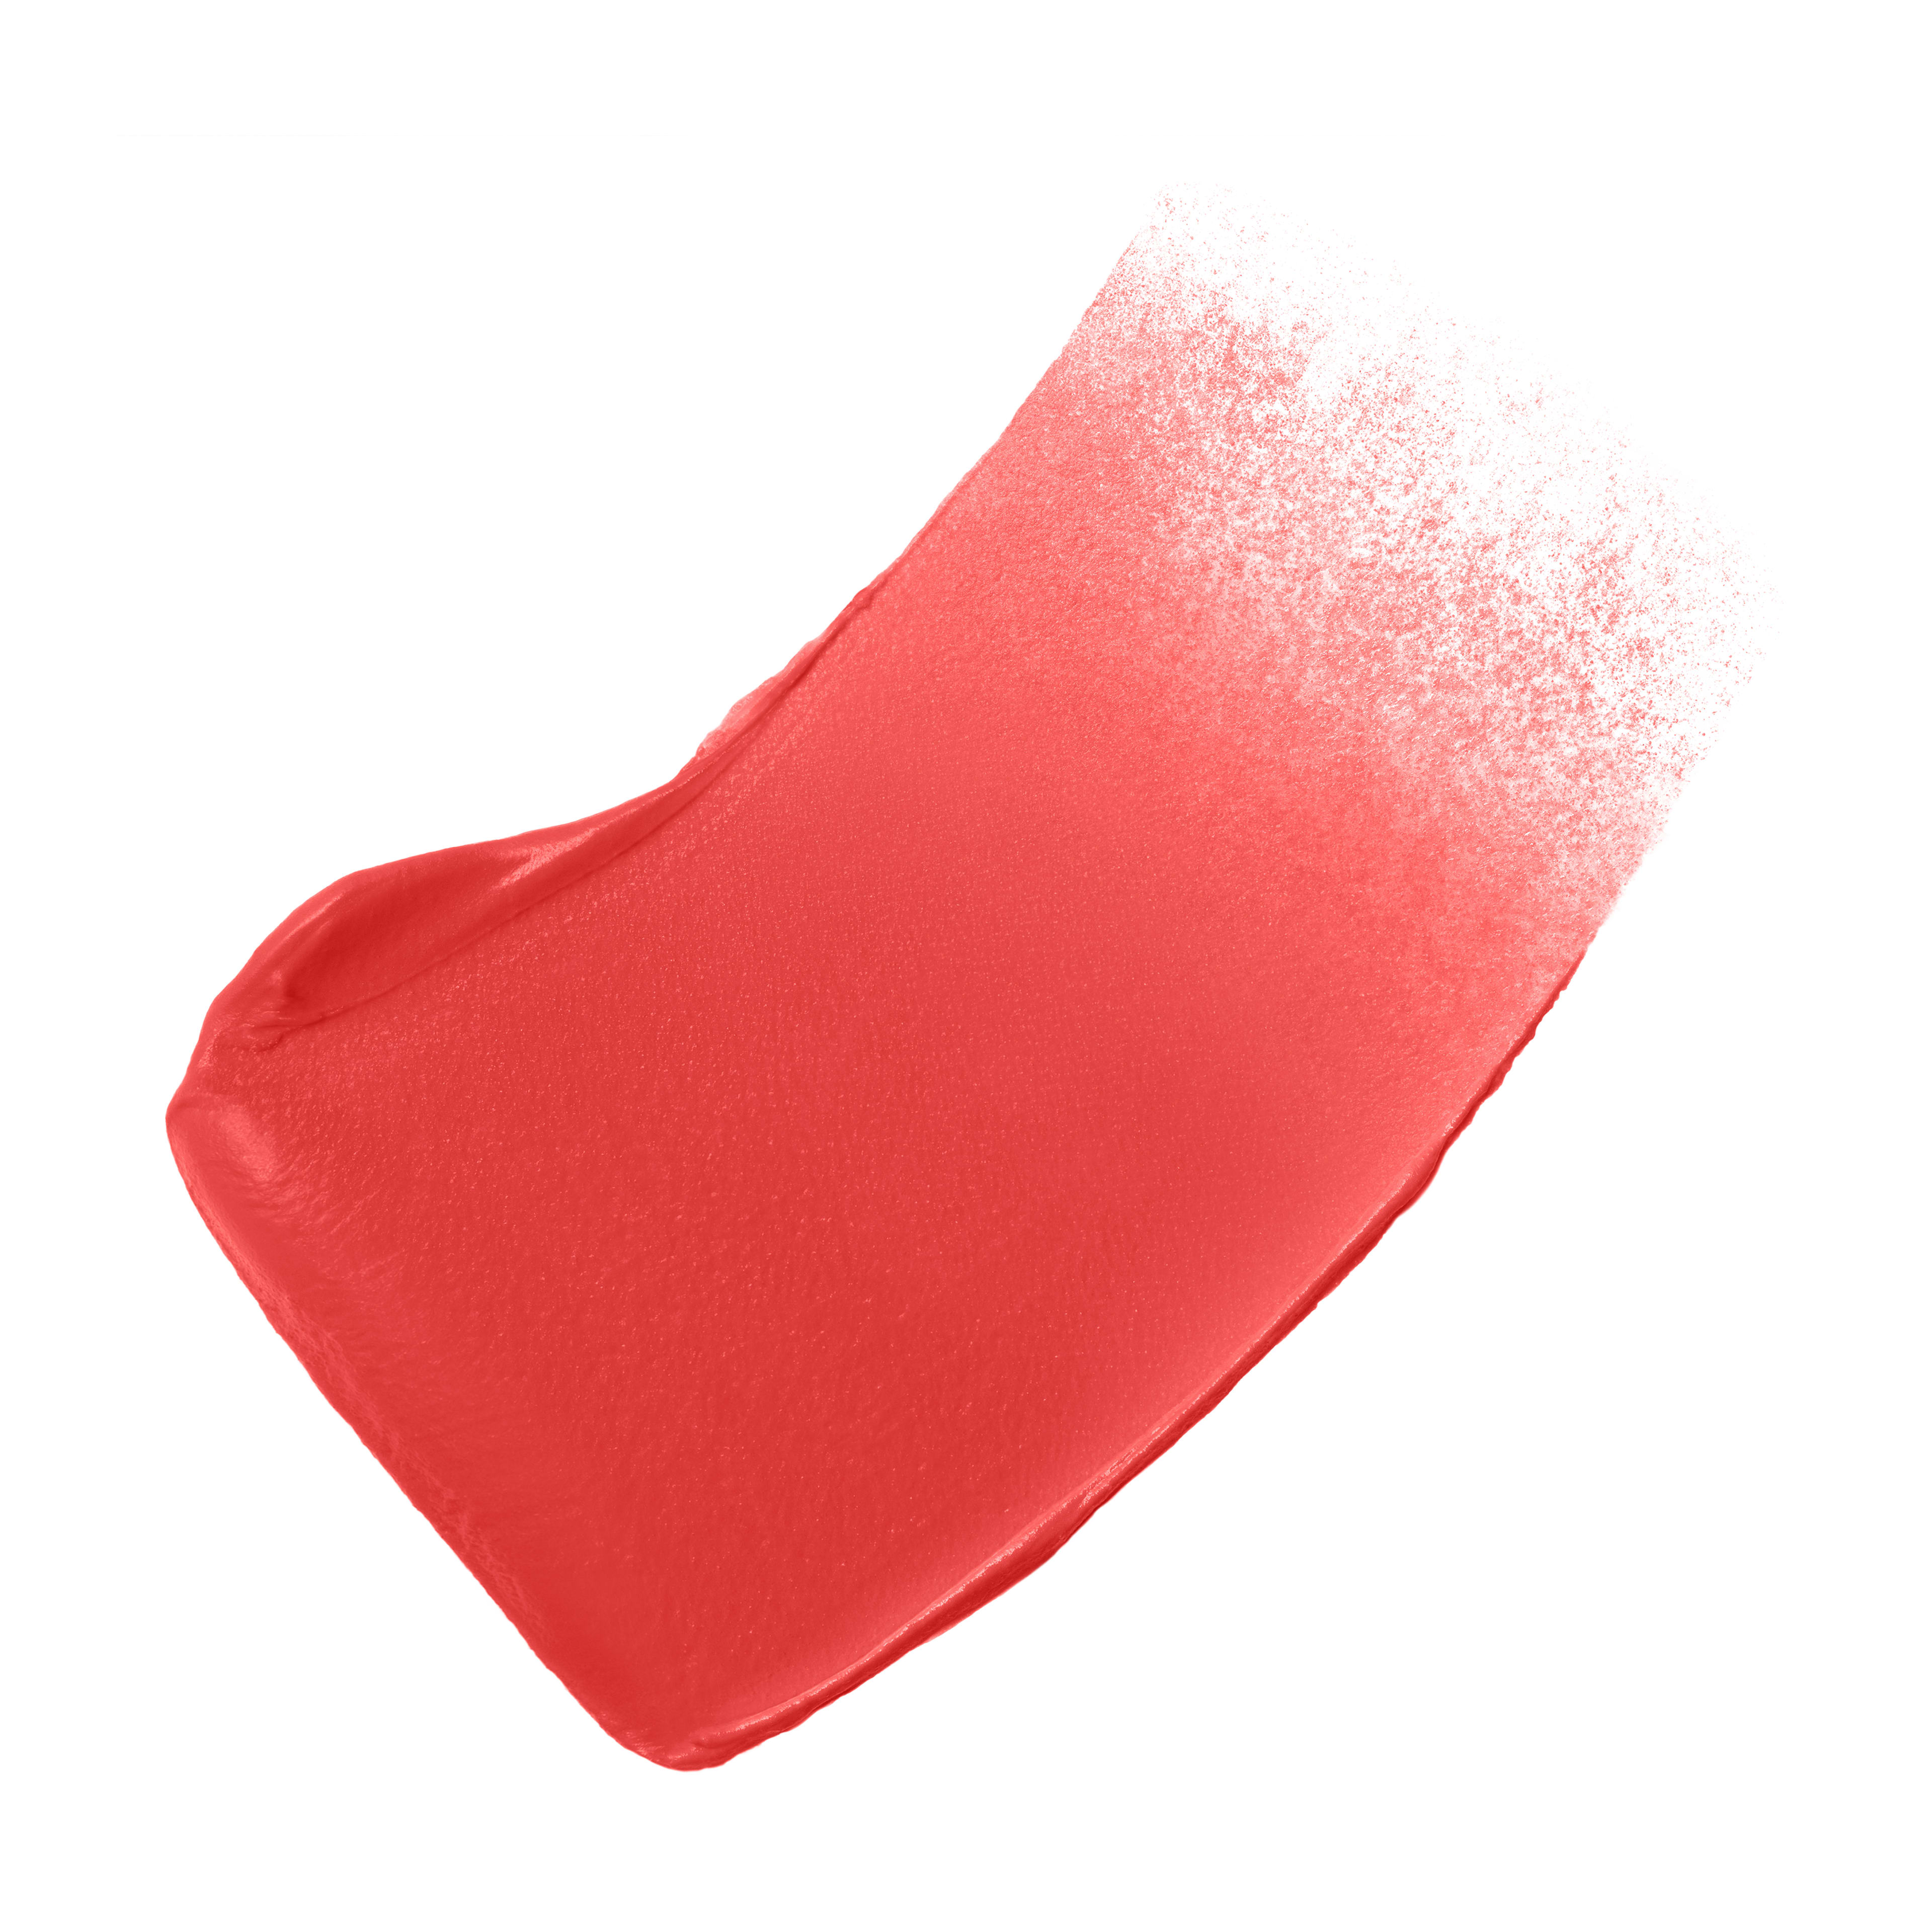 ROUGE ALLURE LIQUID POWDER - makeup - 0.3FL. OZ. - Basic texture view